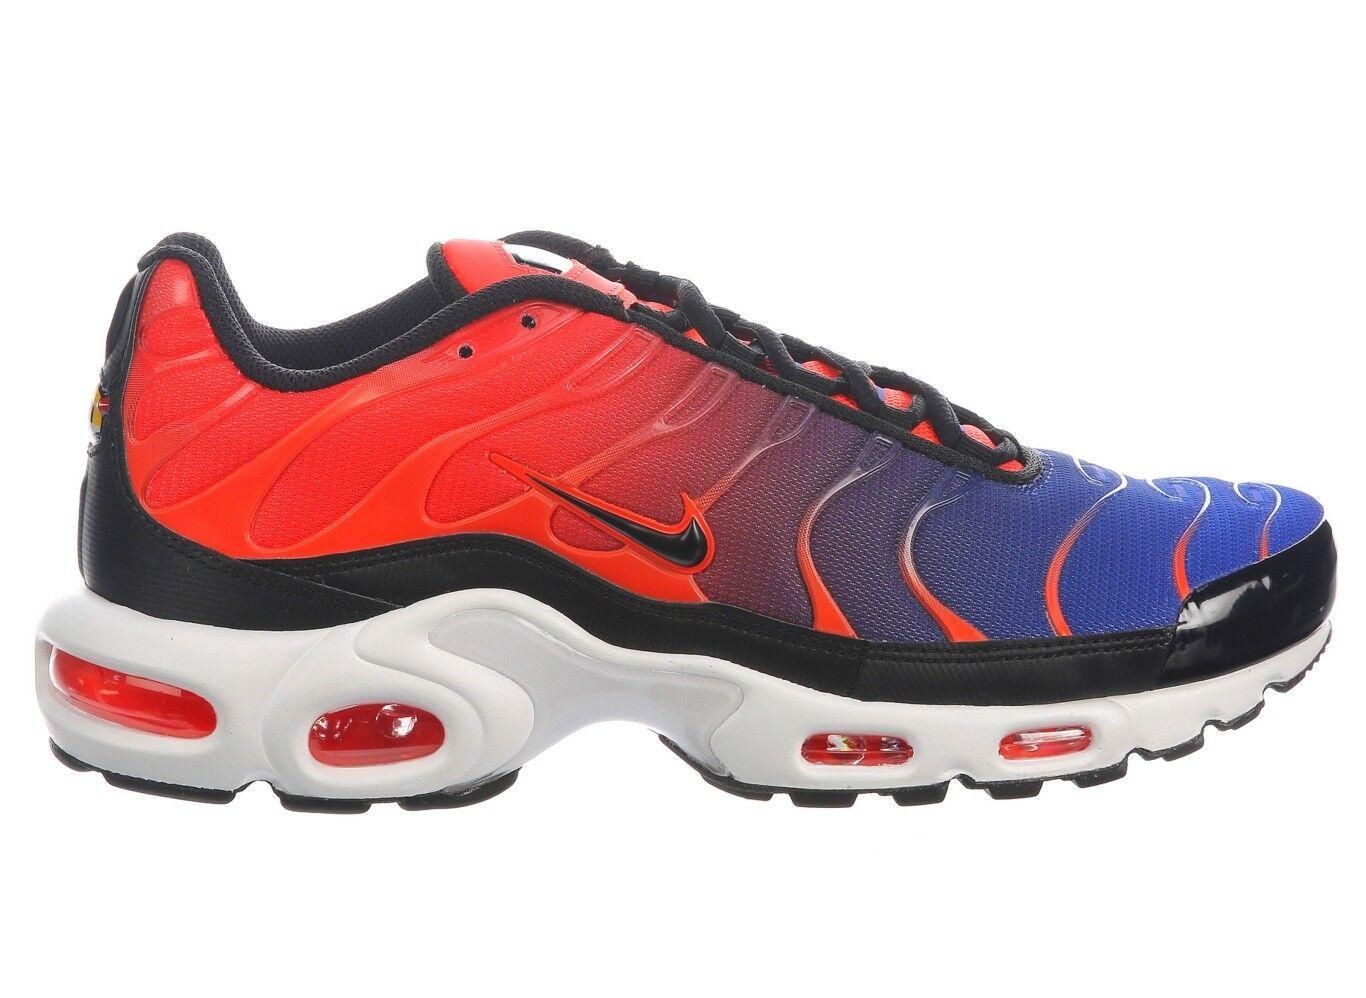 Nike Air Max Plus Mens 852630-800 Crimson Black bluee Running shoes Size 9